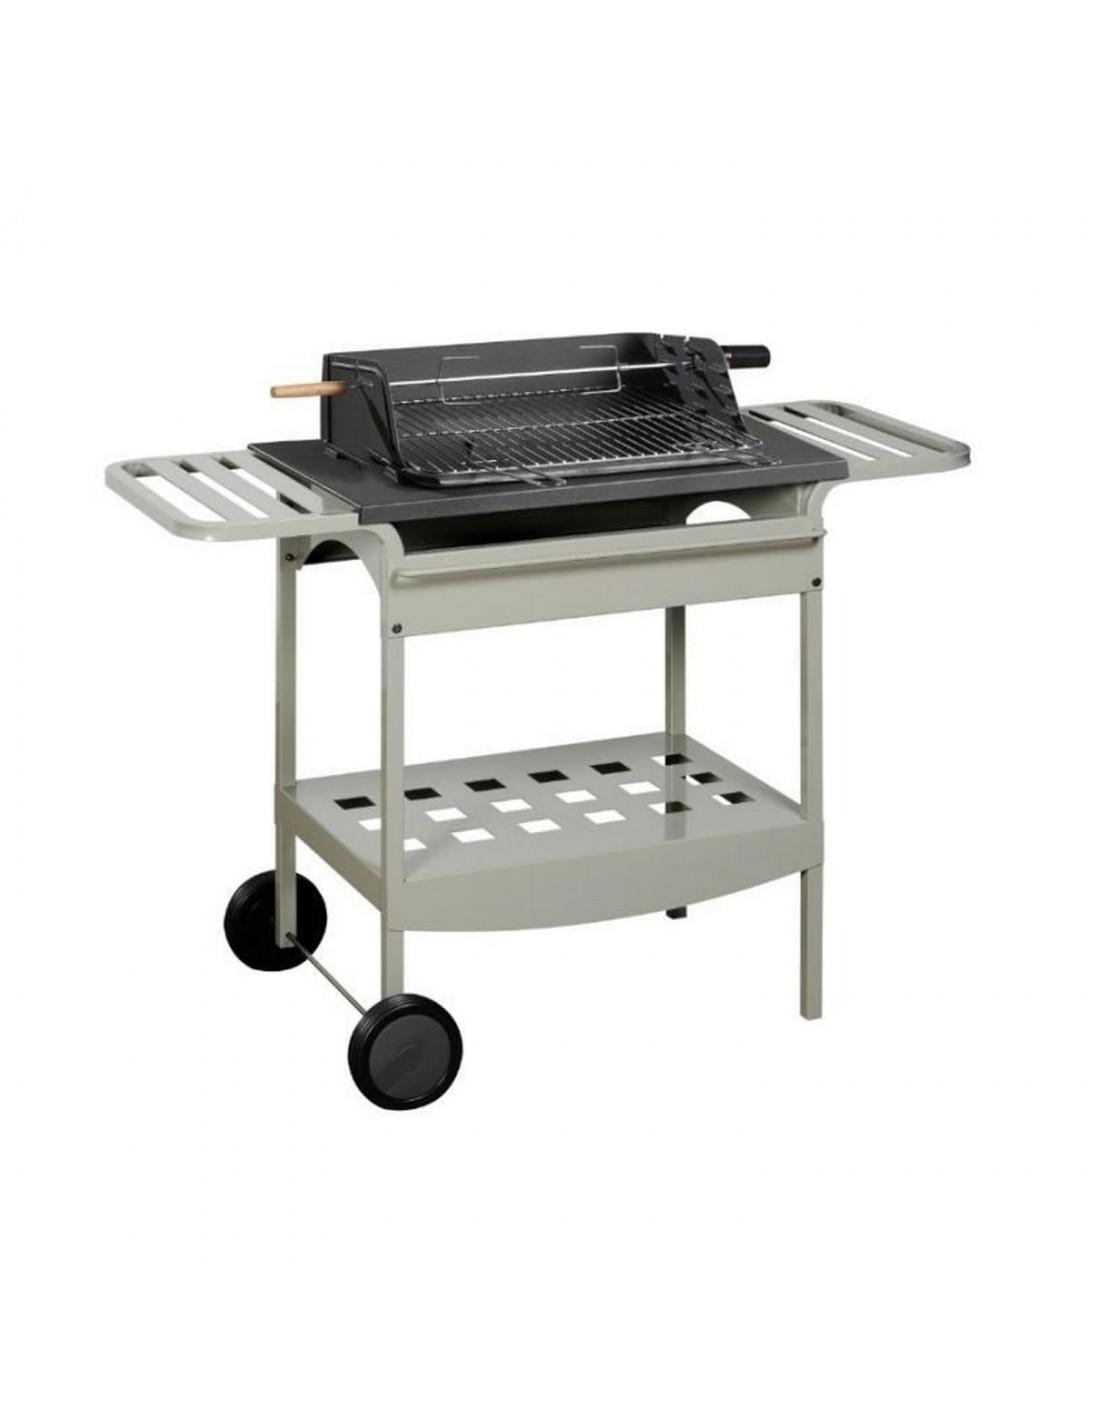 barbecue fonte madisson gril bois et charbon chariot. Black Bedroom Furniture Sets. Home Design Ideas